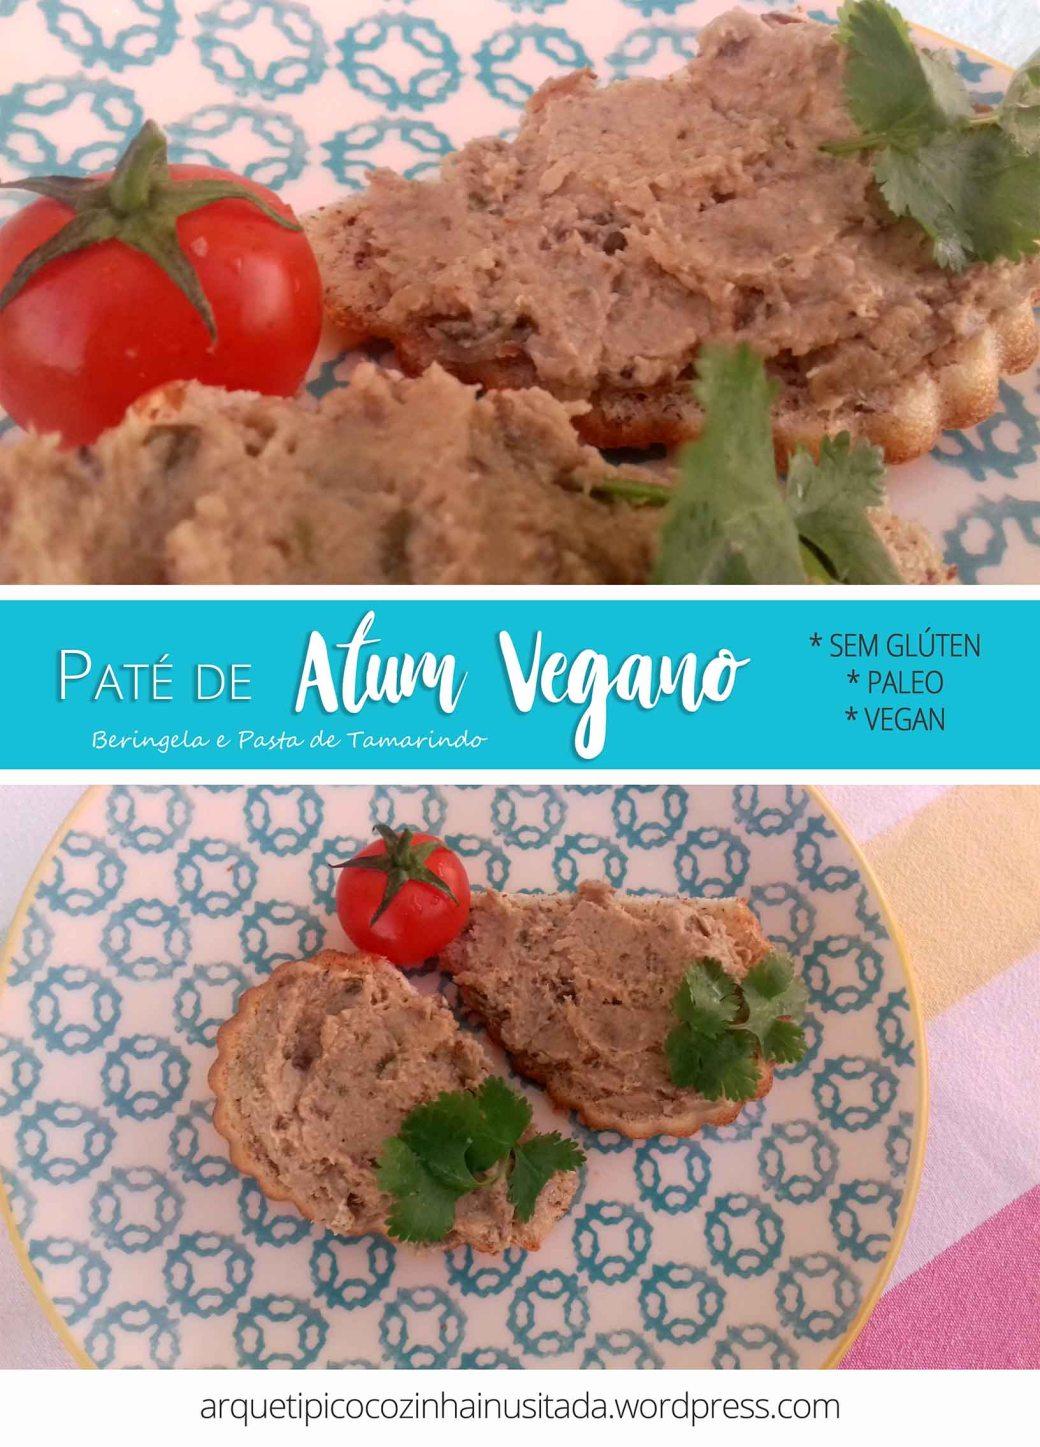 Paté de Atum Vegano - Beringela e Pasta de Tamarindo Pin